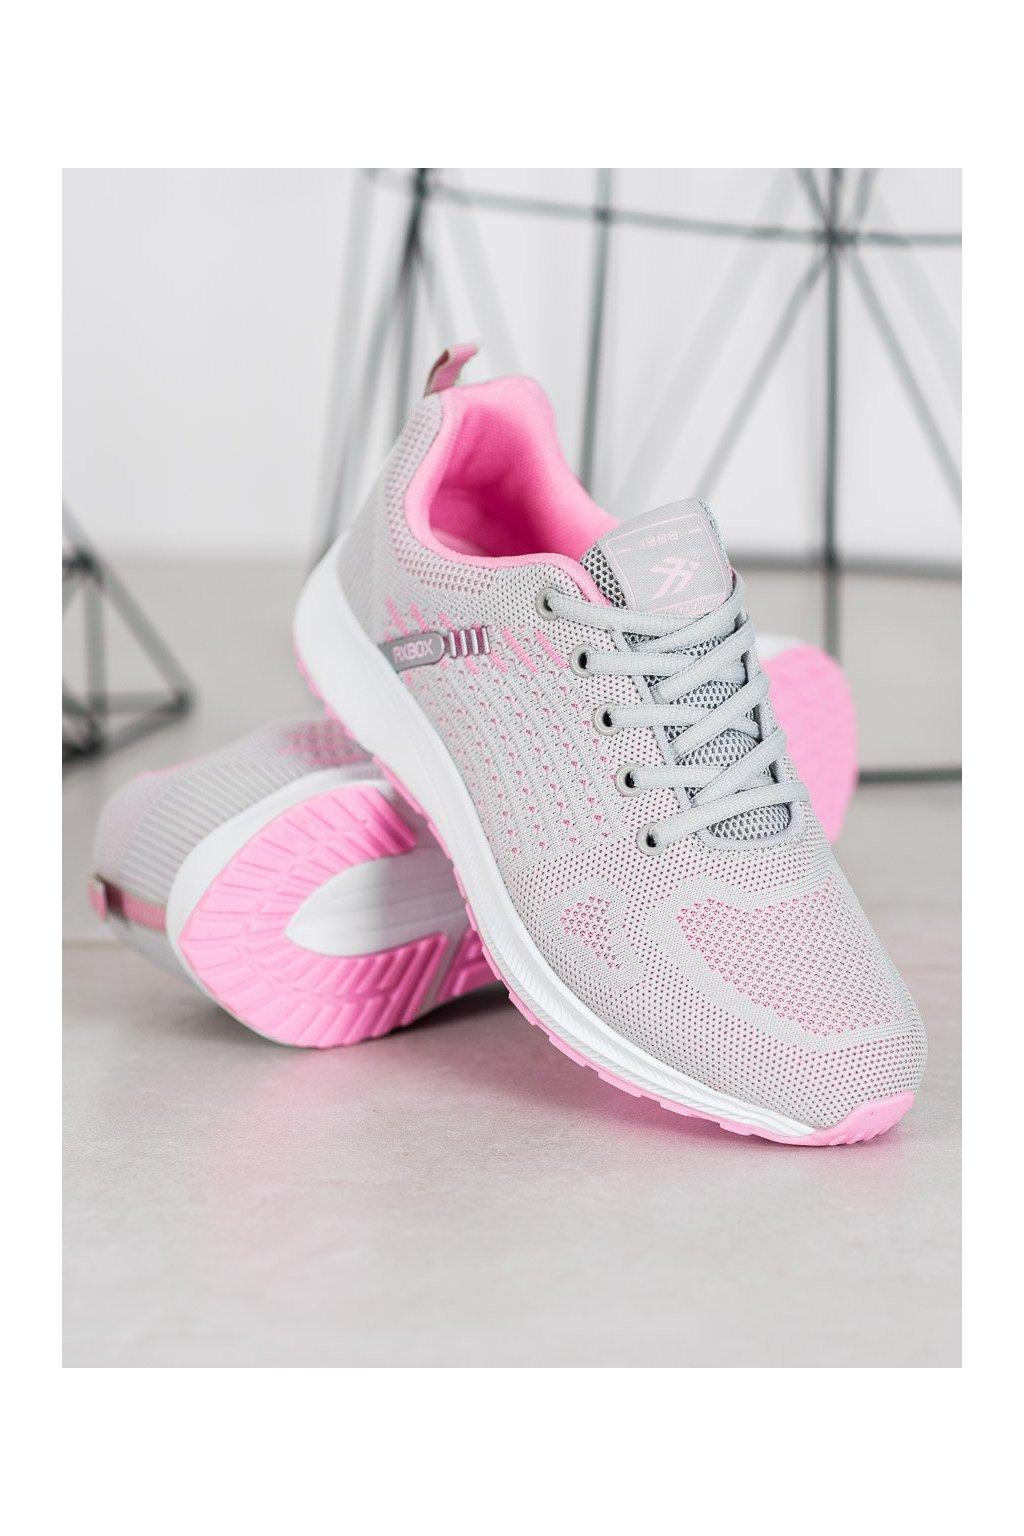 Ružové tenisky Ax boxing kod BPW0154G/P